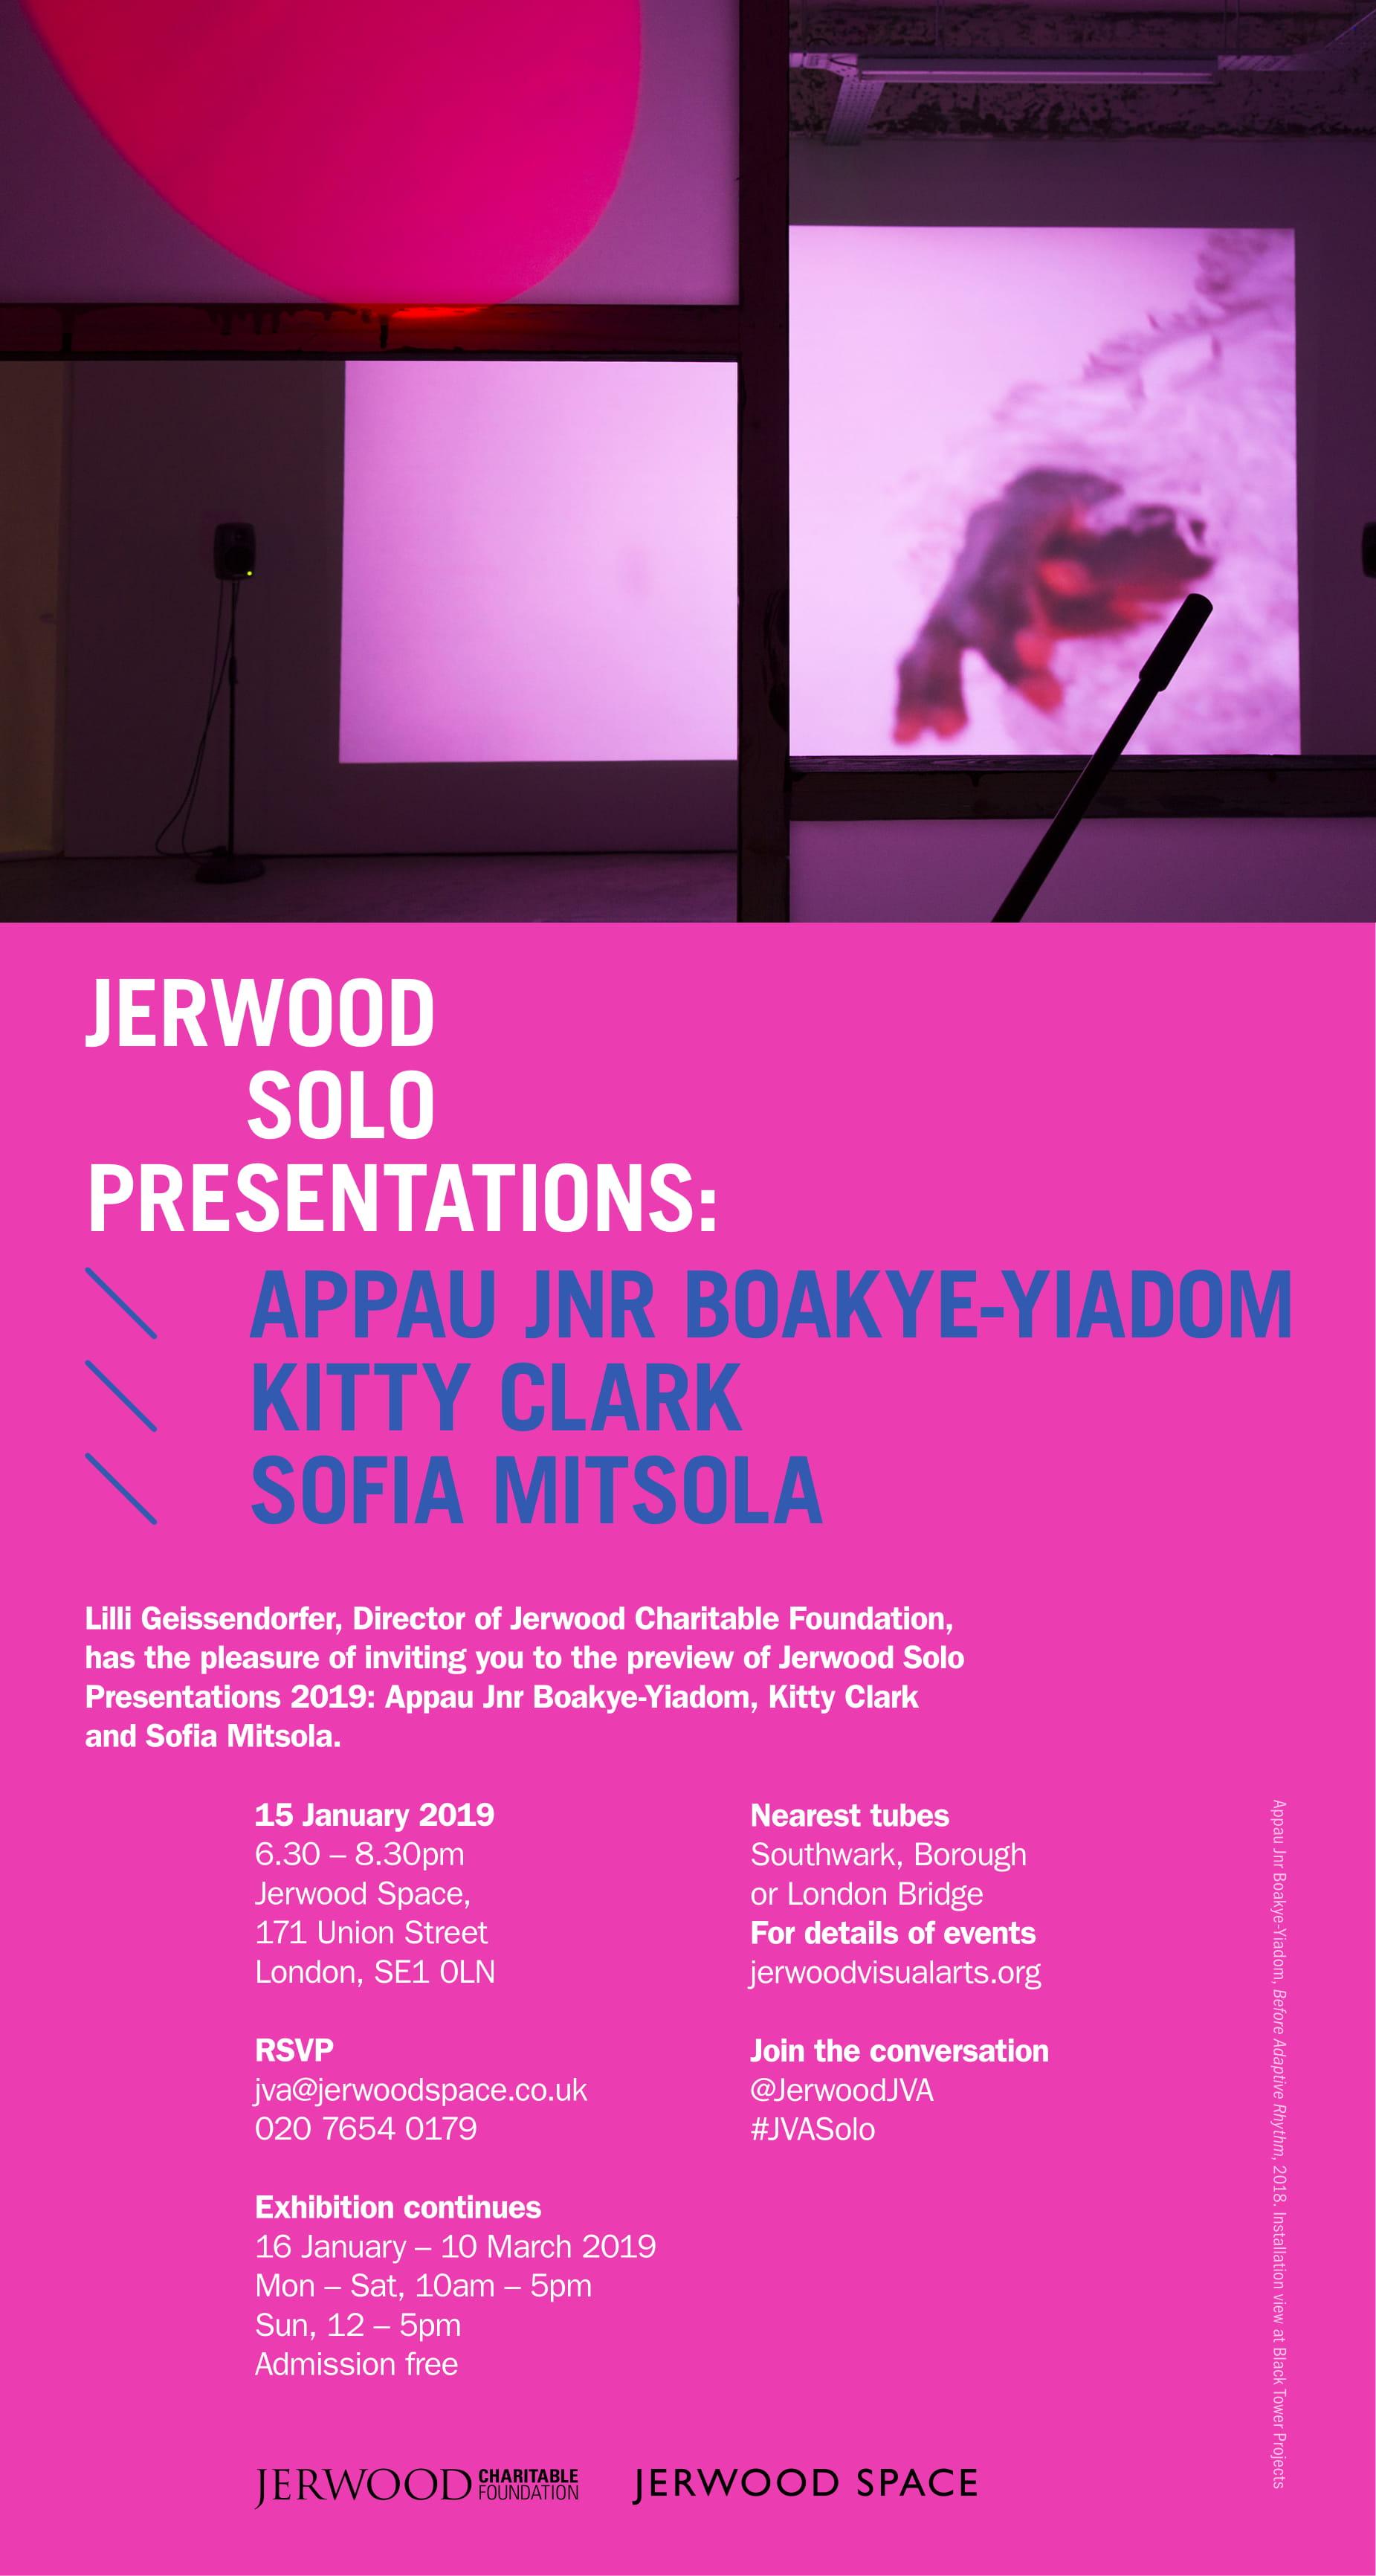 Jerwood SoloPresentations 2019 e-invitation.jpg